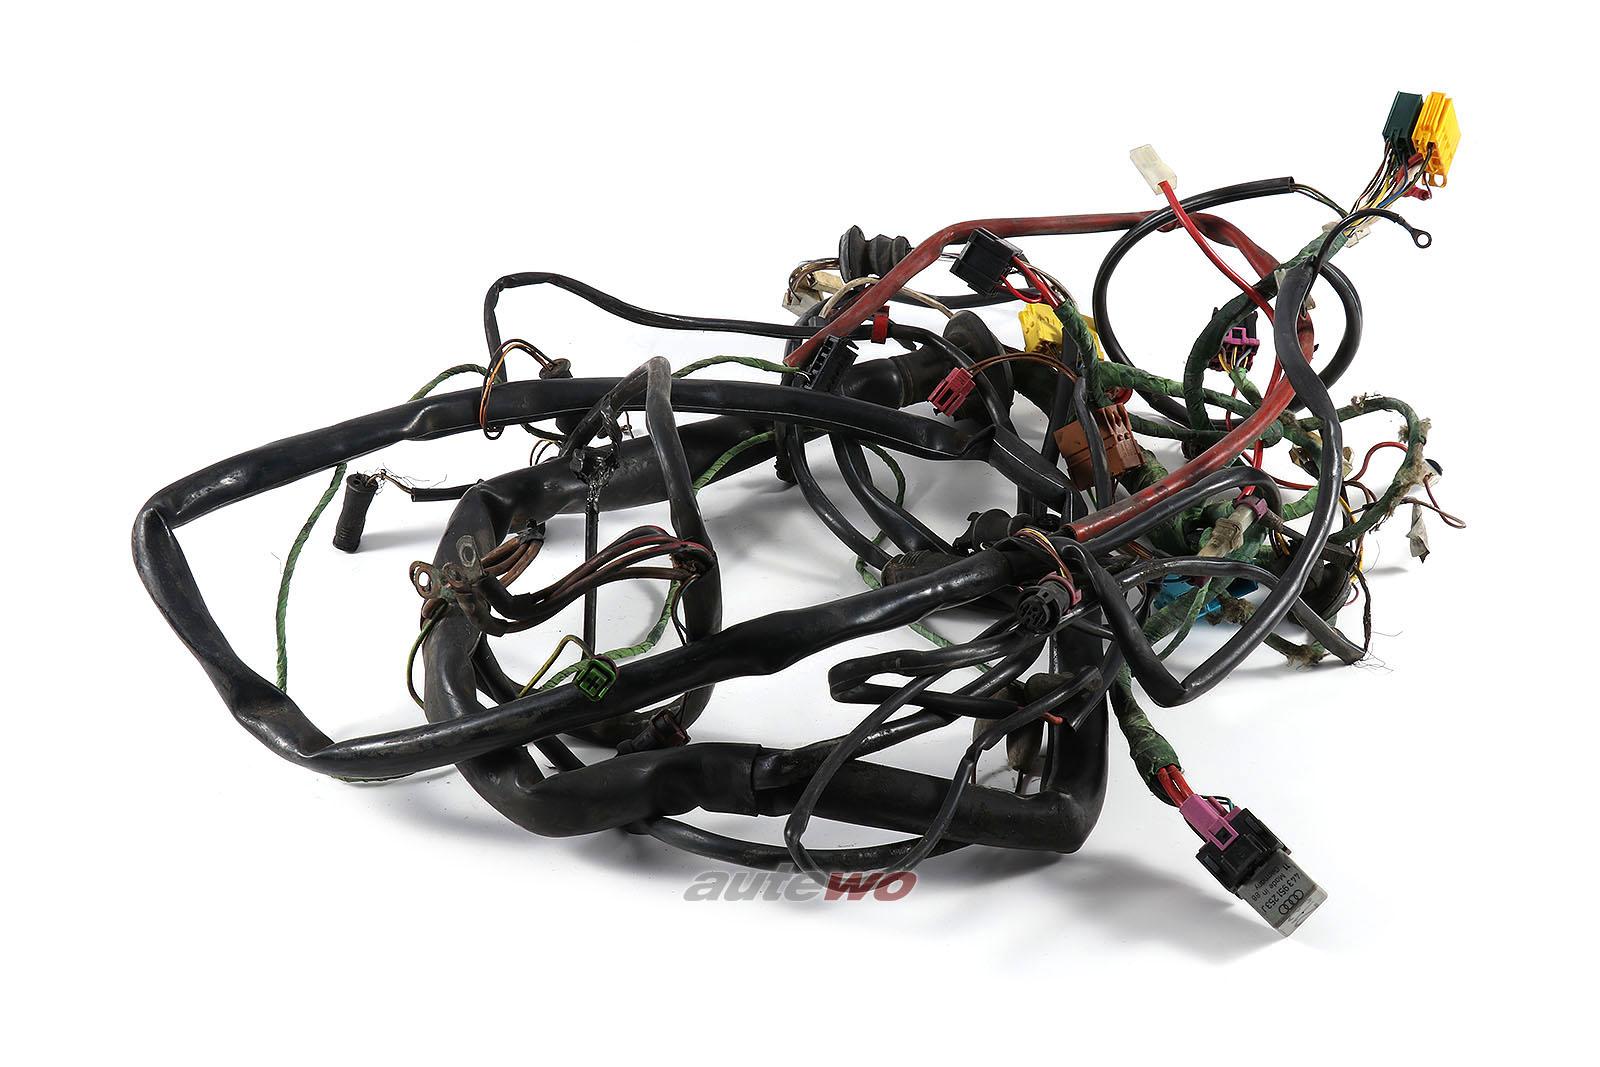 447971071CF Audi 100/200 Typ 44 Kabelbaum Beleuchtung + Checksystem/Klima